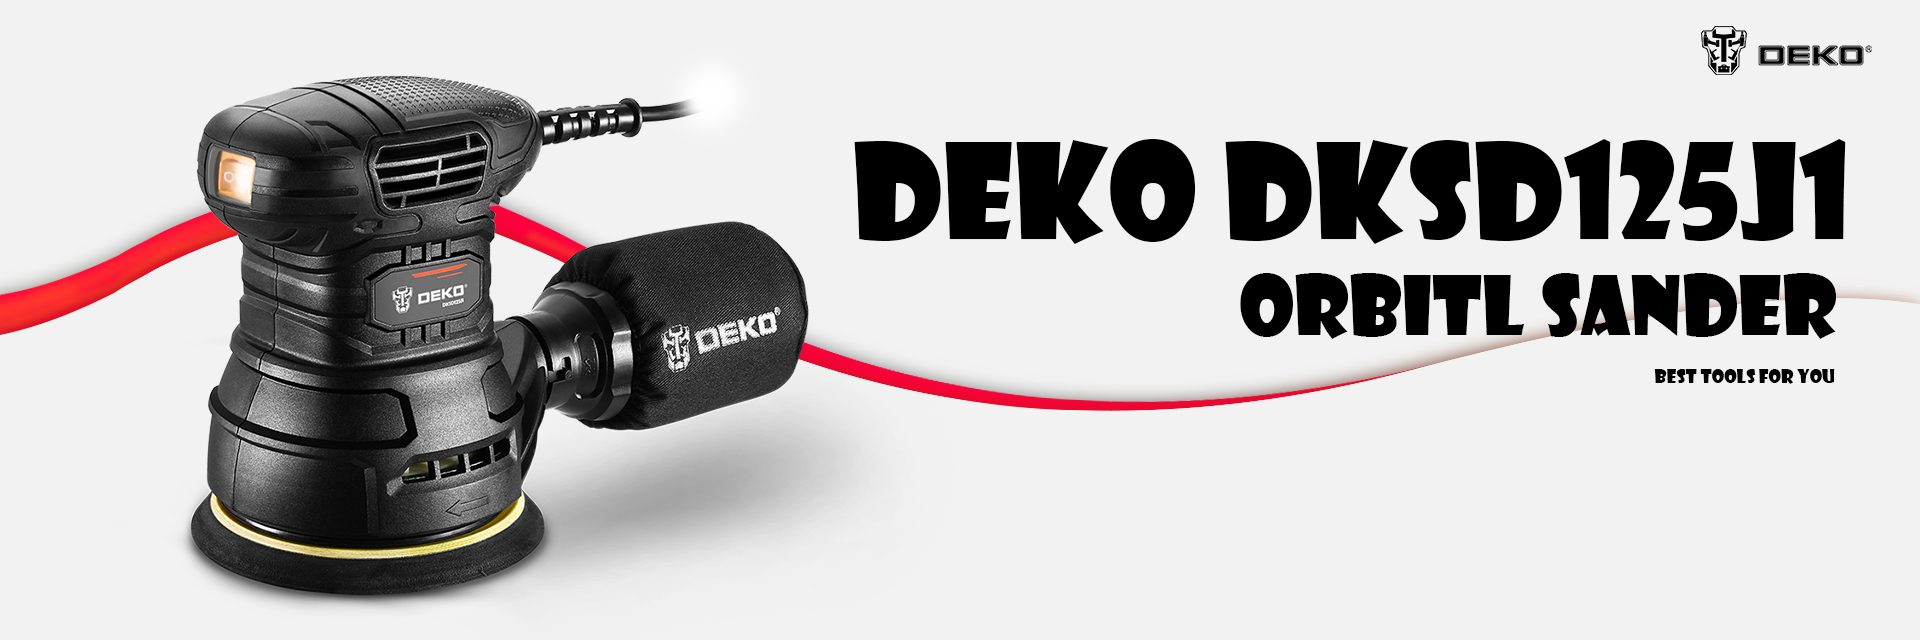 DEKO DKSD125J1 350W Random Orbit Sander